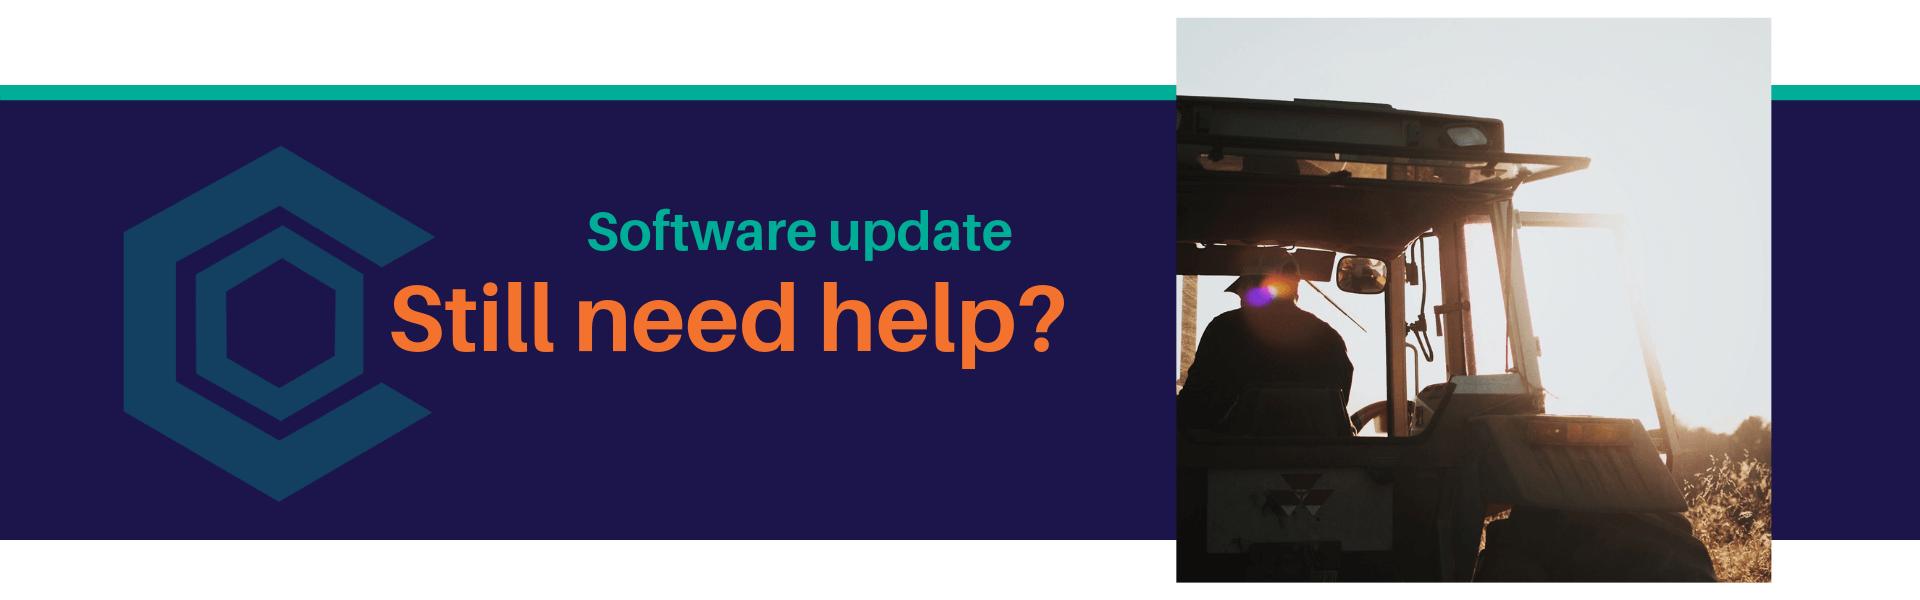 Update help